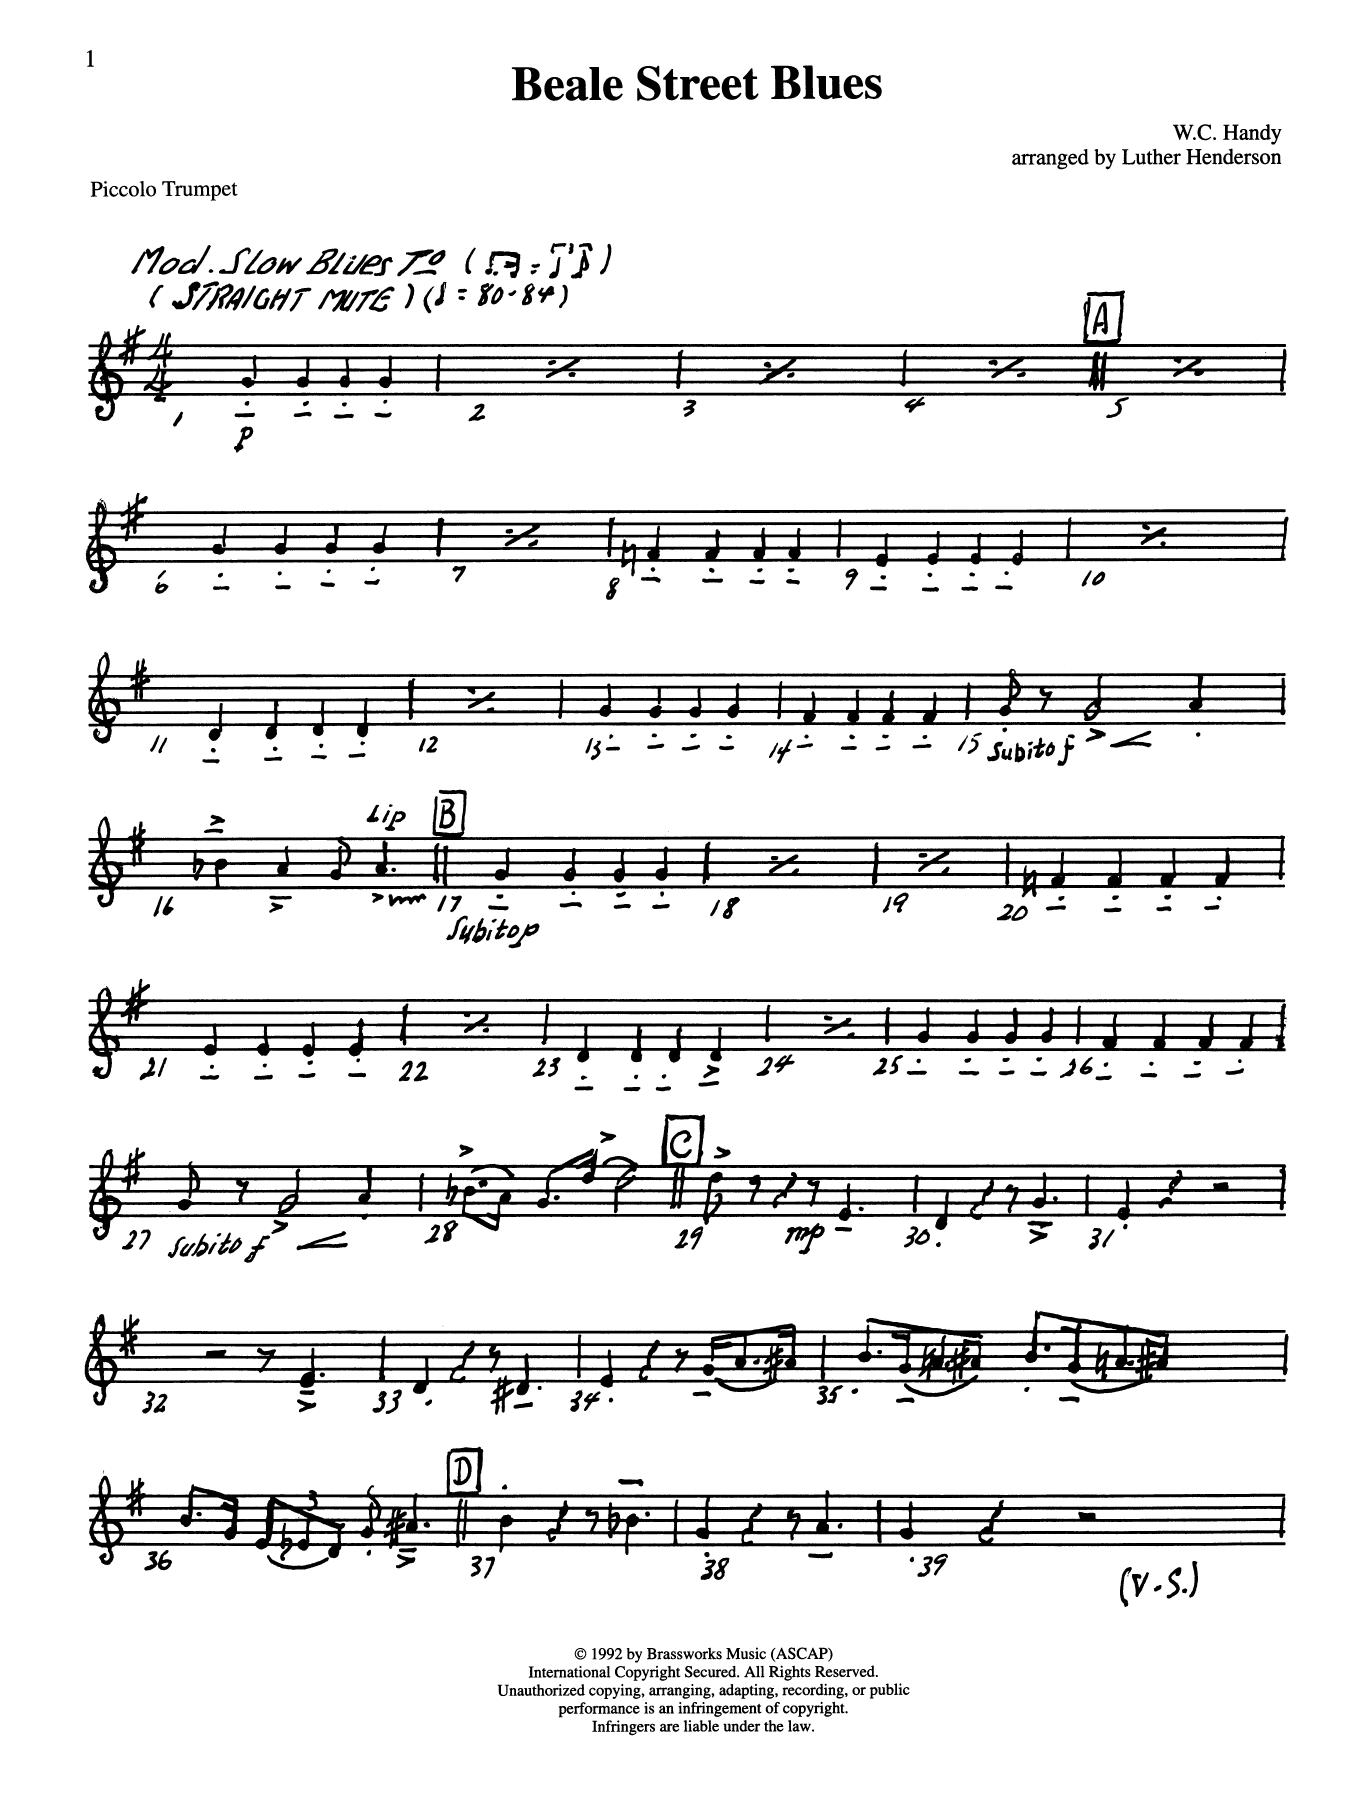 Beale Street Blues - Bb Piccolo Trumpet Sheet Music